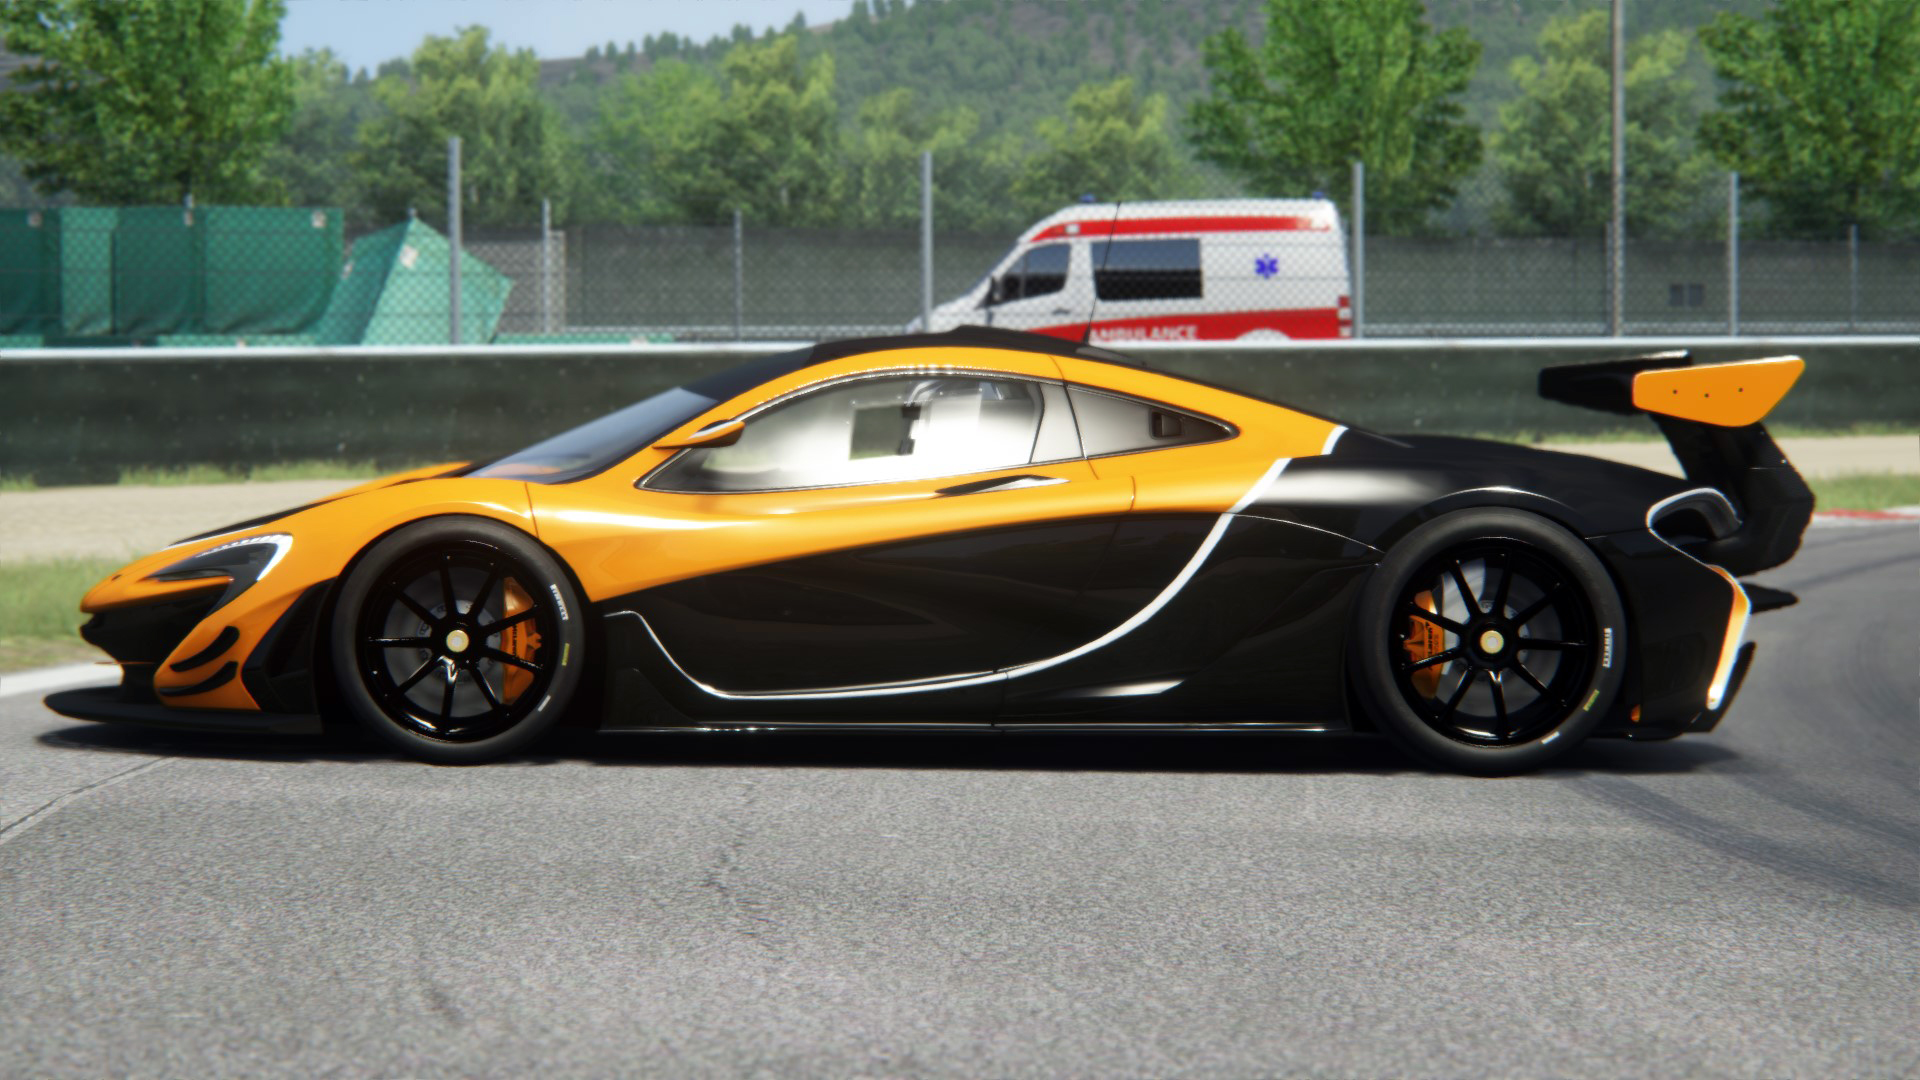 mclaren p1 gtr orange black racedepartment. Black Bedroom Furniture Sets. Home Design Ideas